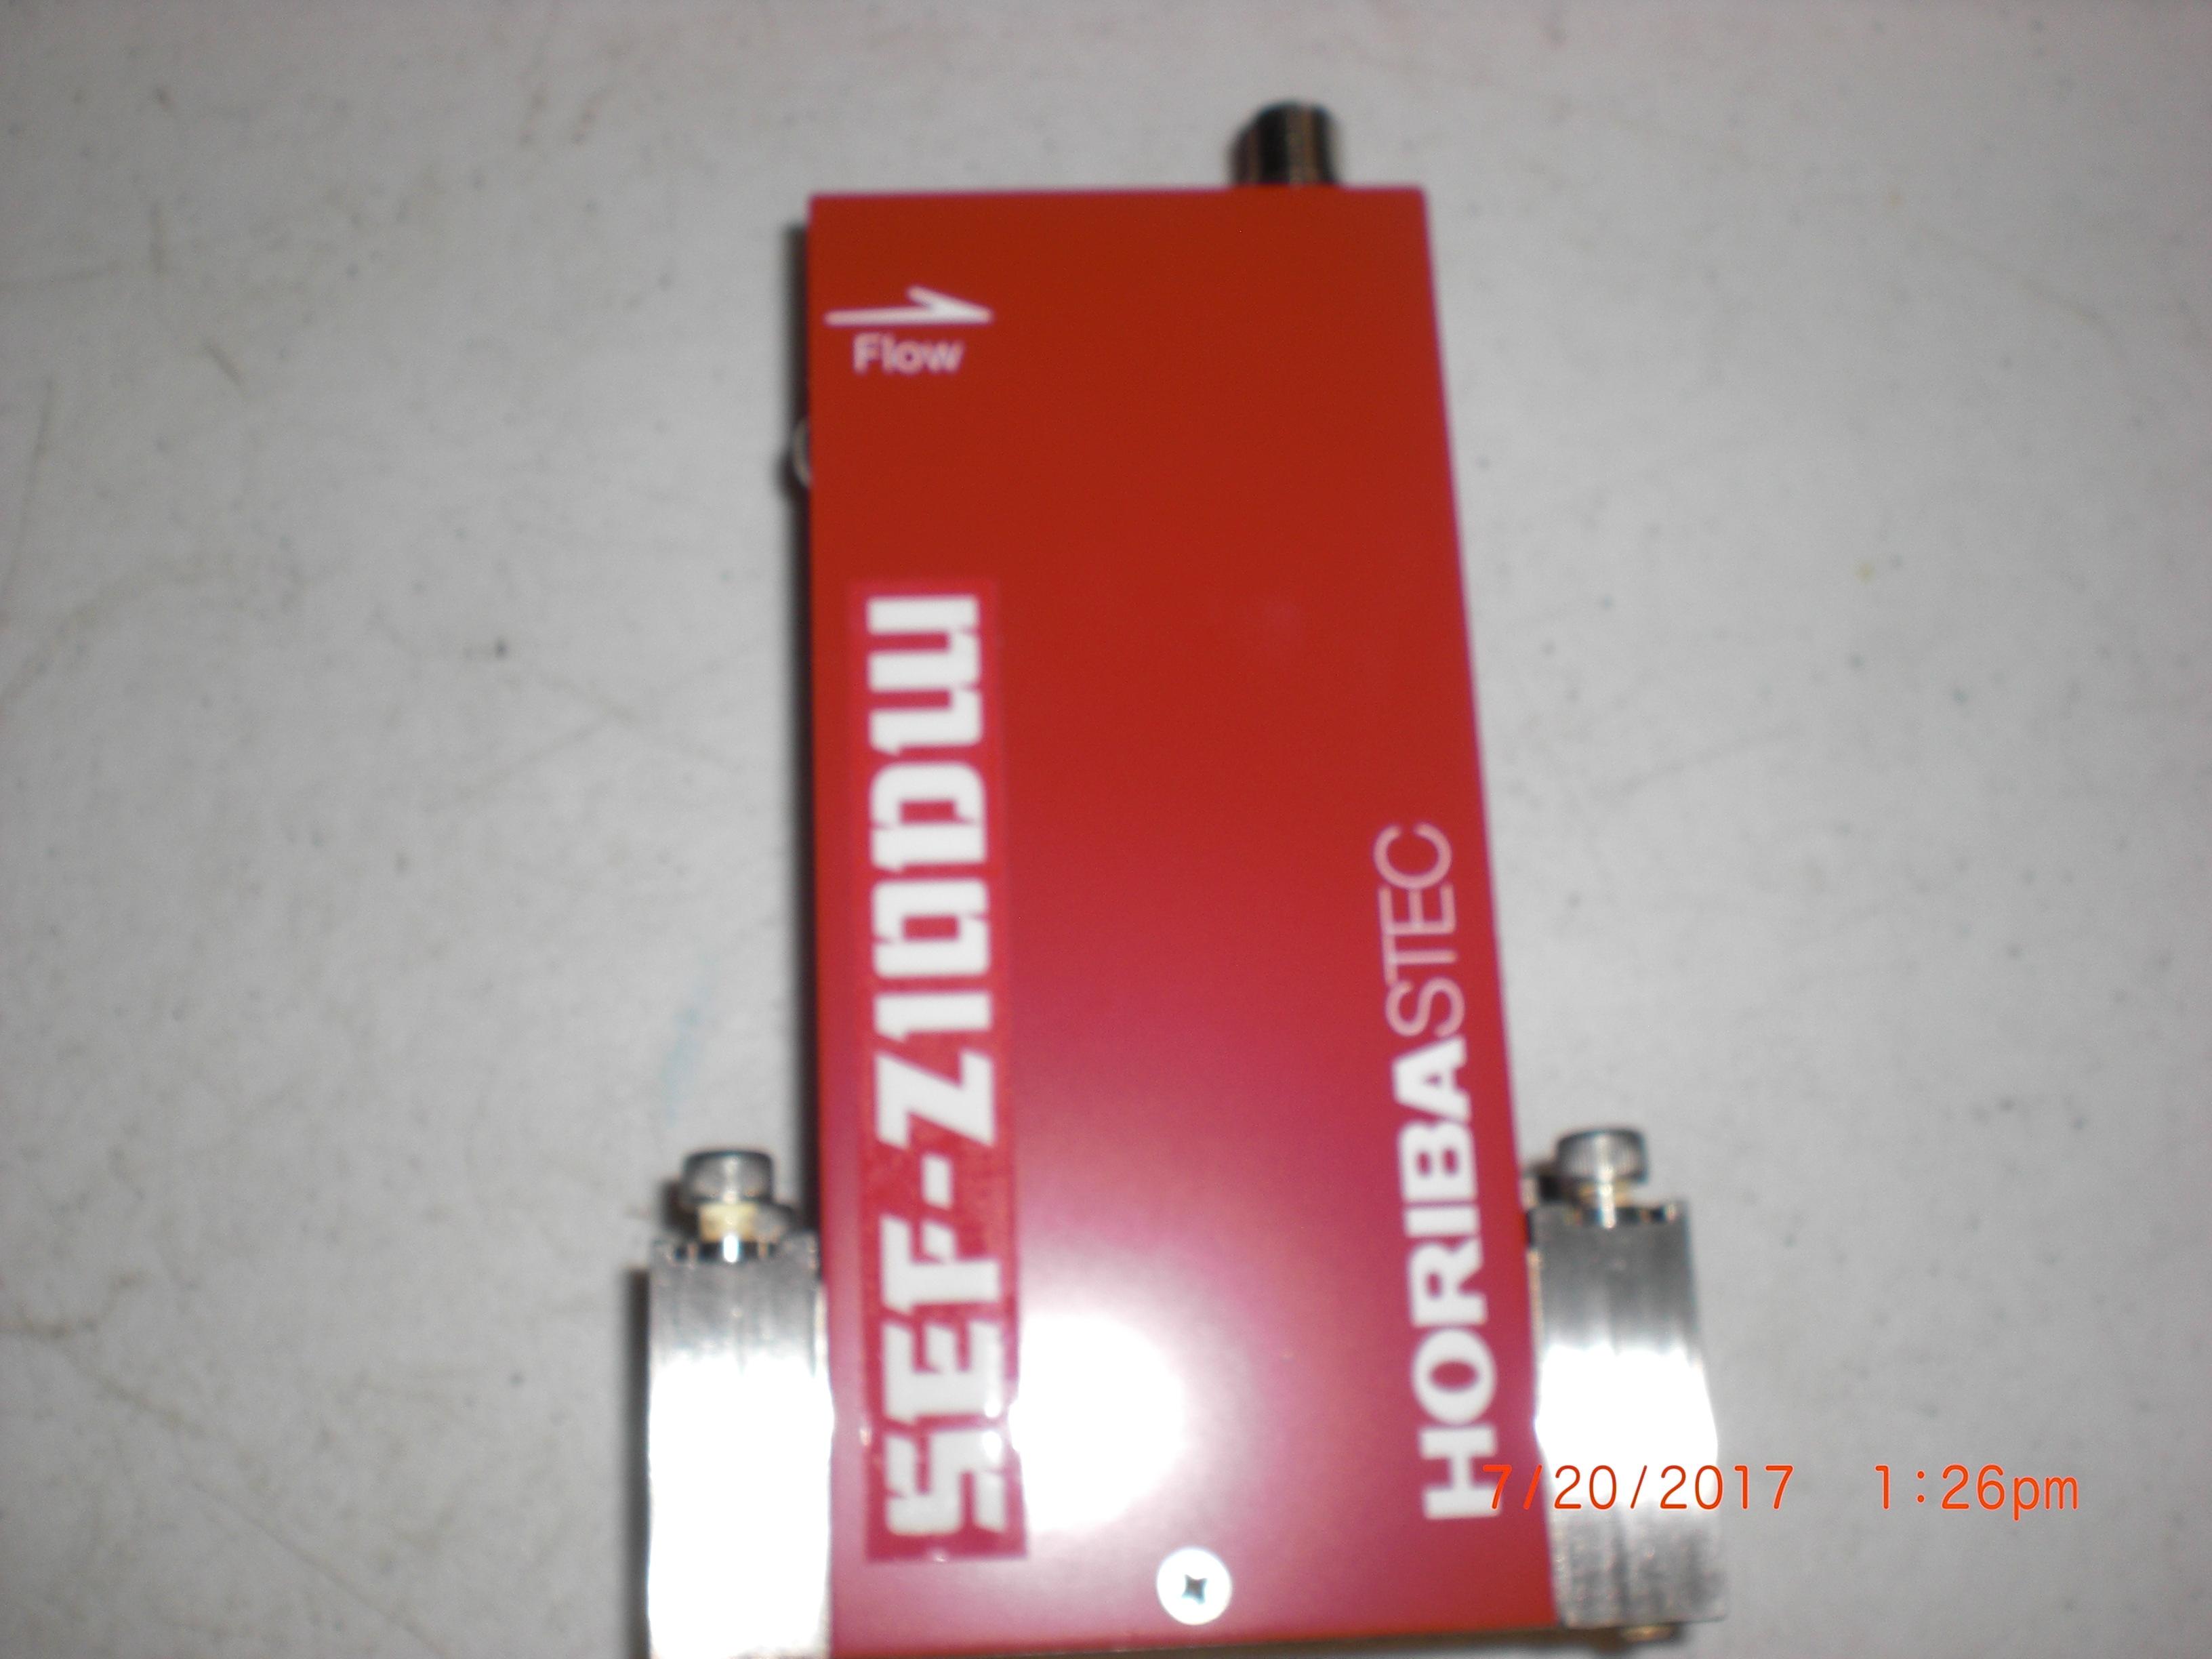 MFC HOREBIA / STEC SEC-Z12DWM-N2-15SLM Harvested never installed System